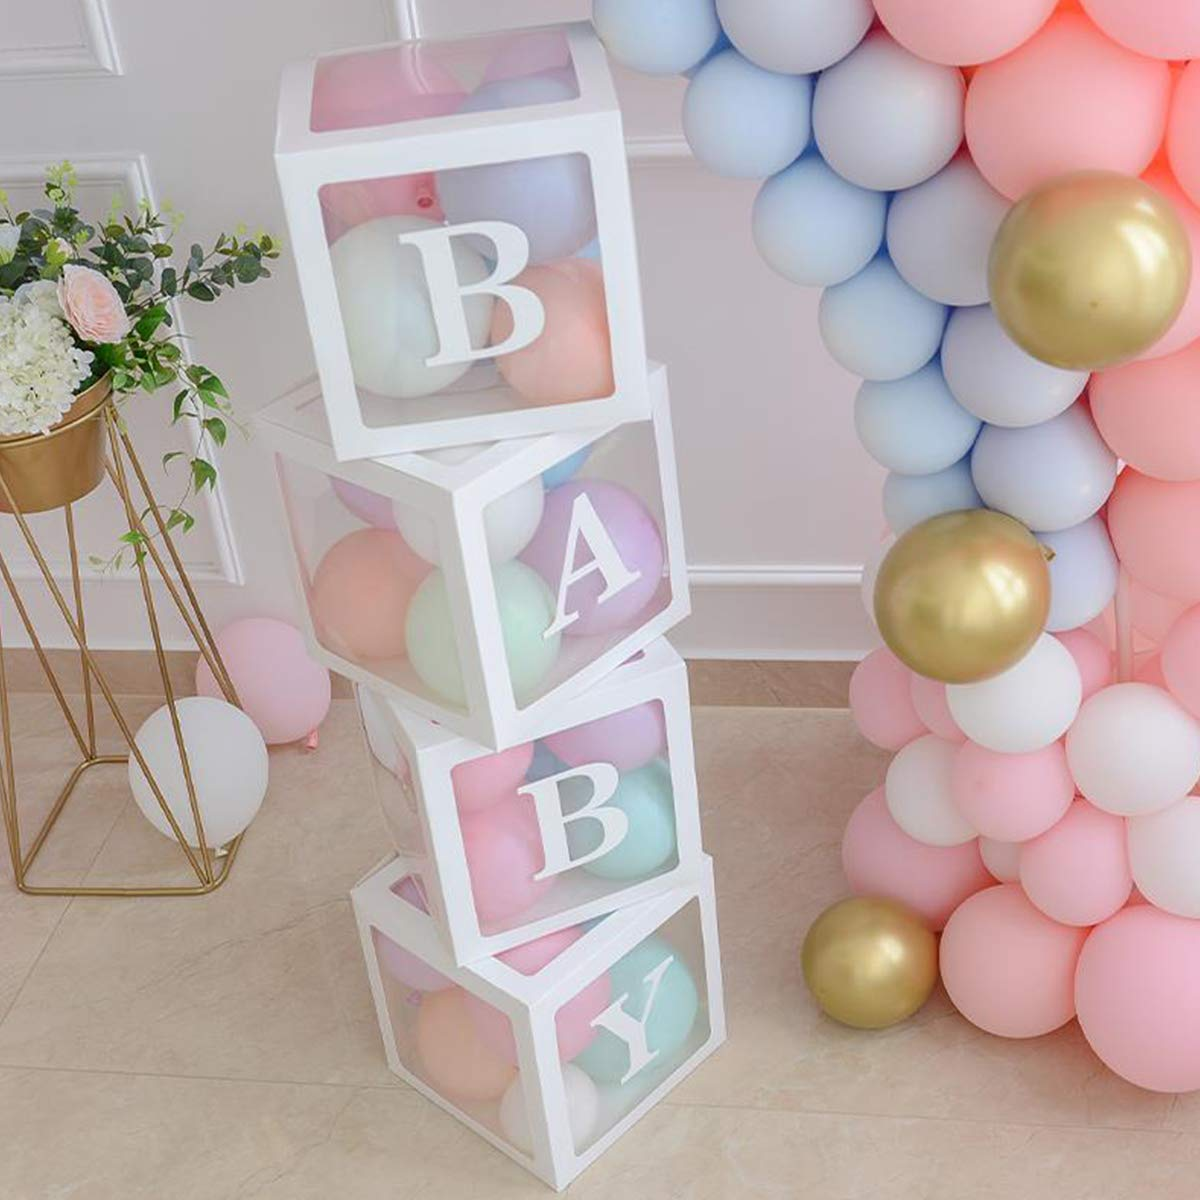 Add 4 Pcs Baby Written Balloon Box for Baby Shower Decoration